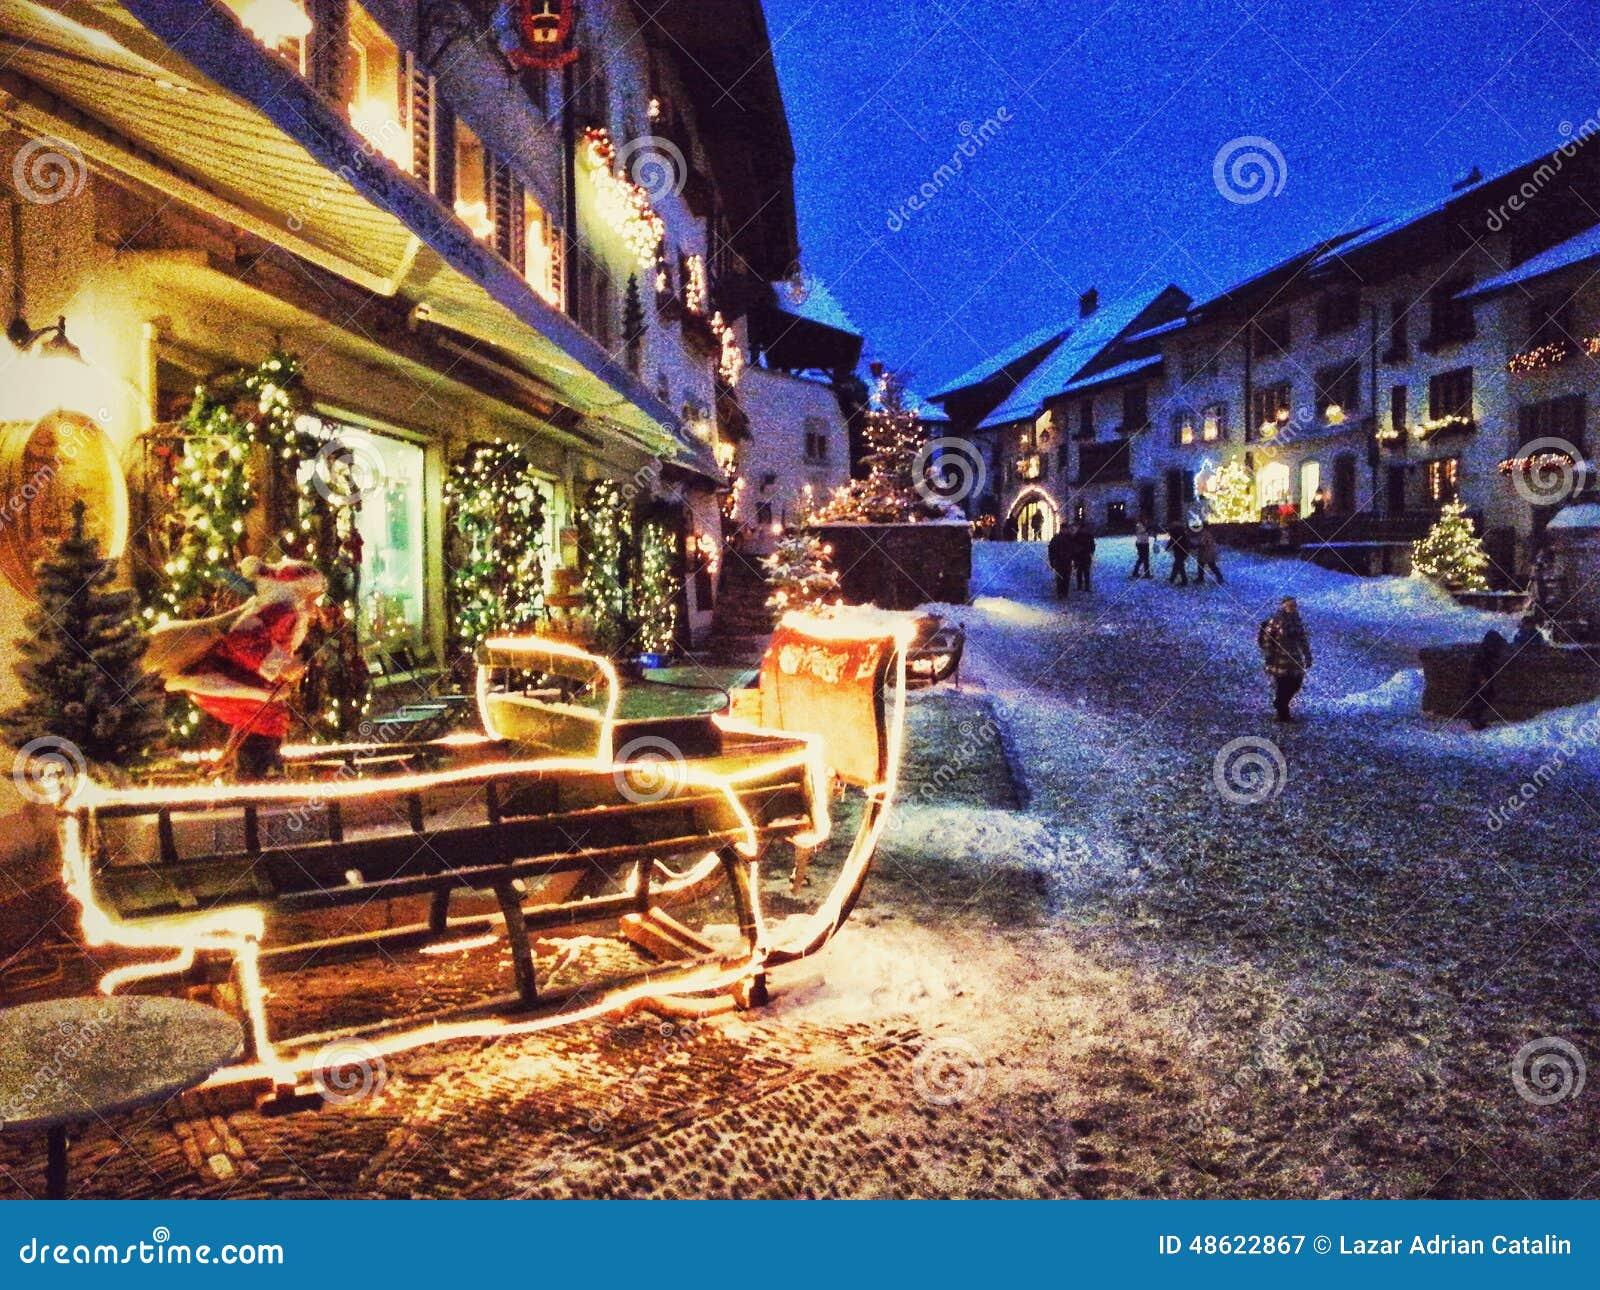 #173AB4 Gruyere Village Switzerland Stock Photo Image: 48622867 5545 decorations noel geneve 1300x1065 px @ aertt.com